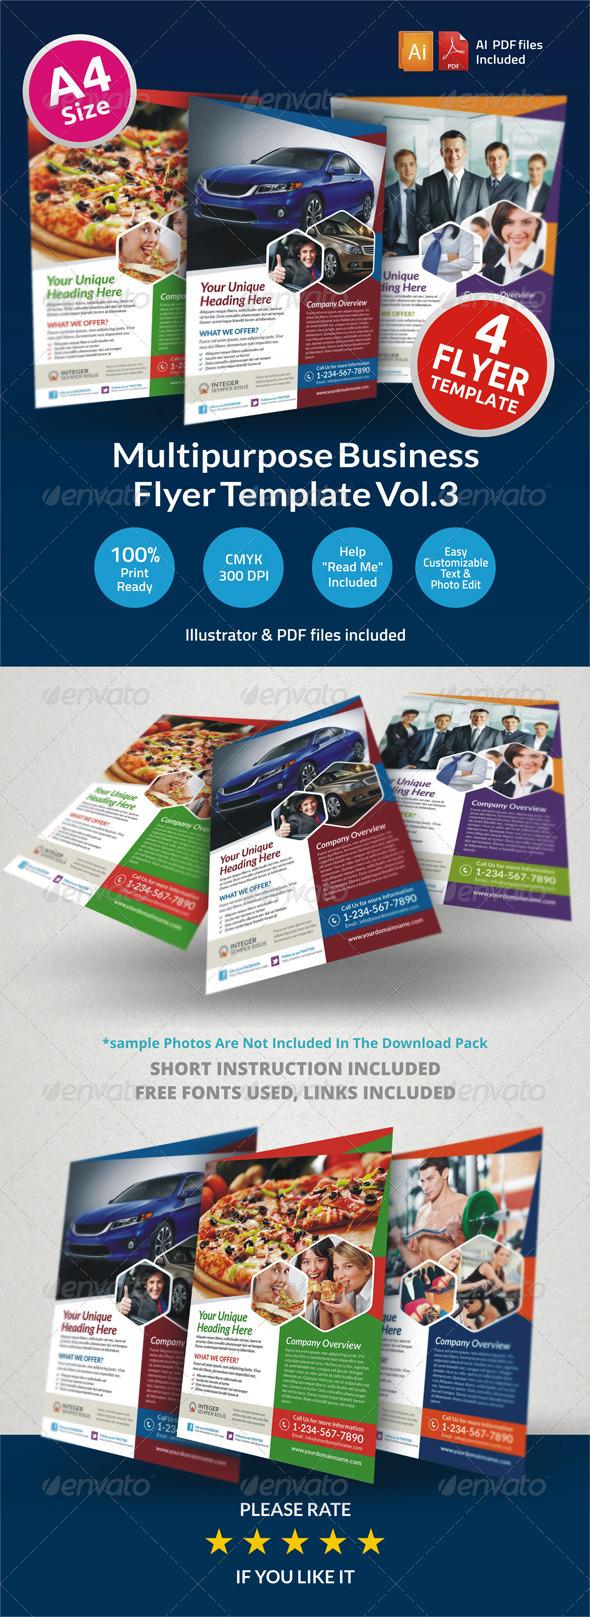 Multipurpose Business Flyer Vol.3 - Corporate Flyers